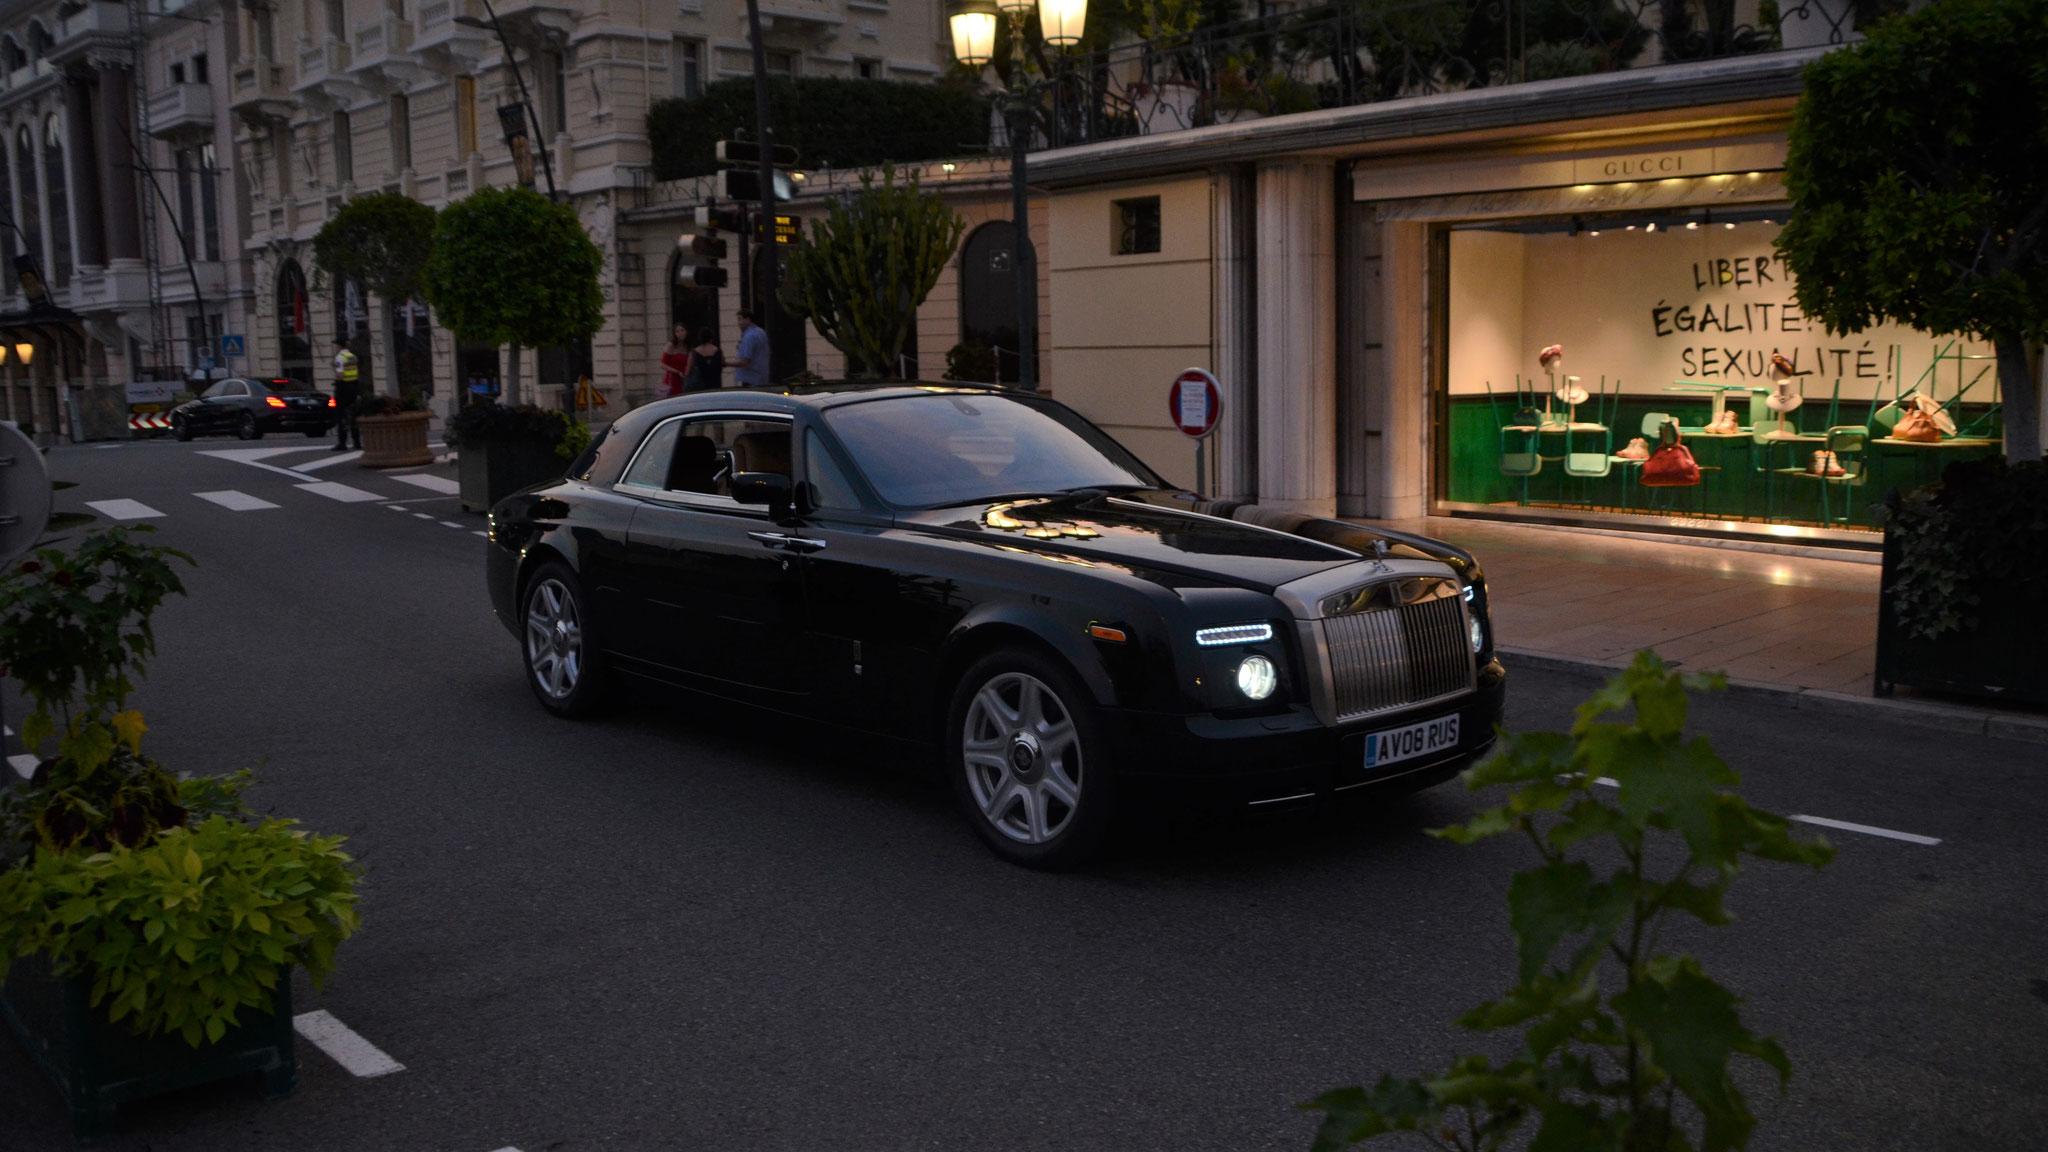 Rolls Royce Drophead Coupé - AV08-RUS (GB)